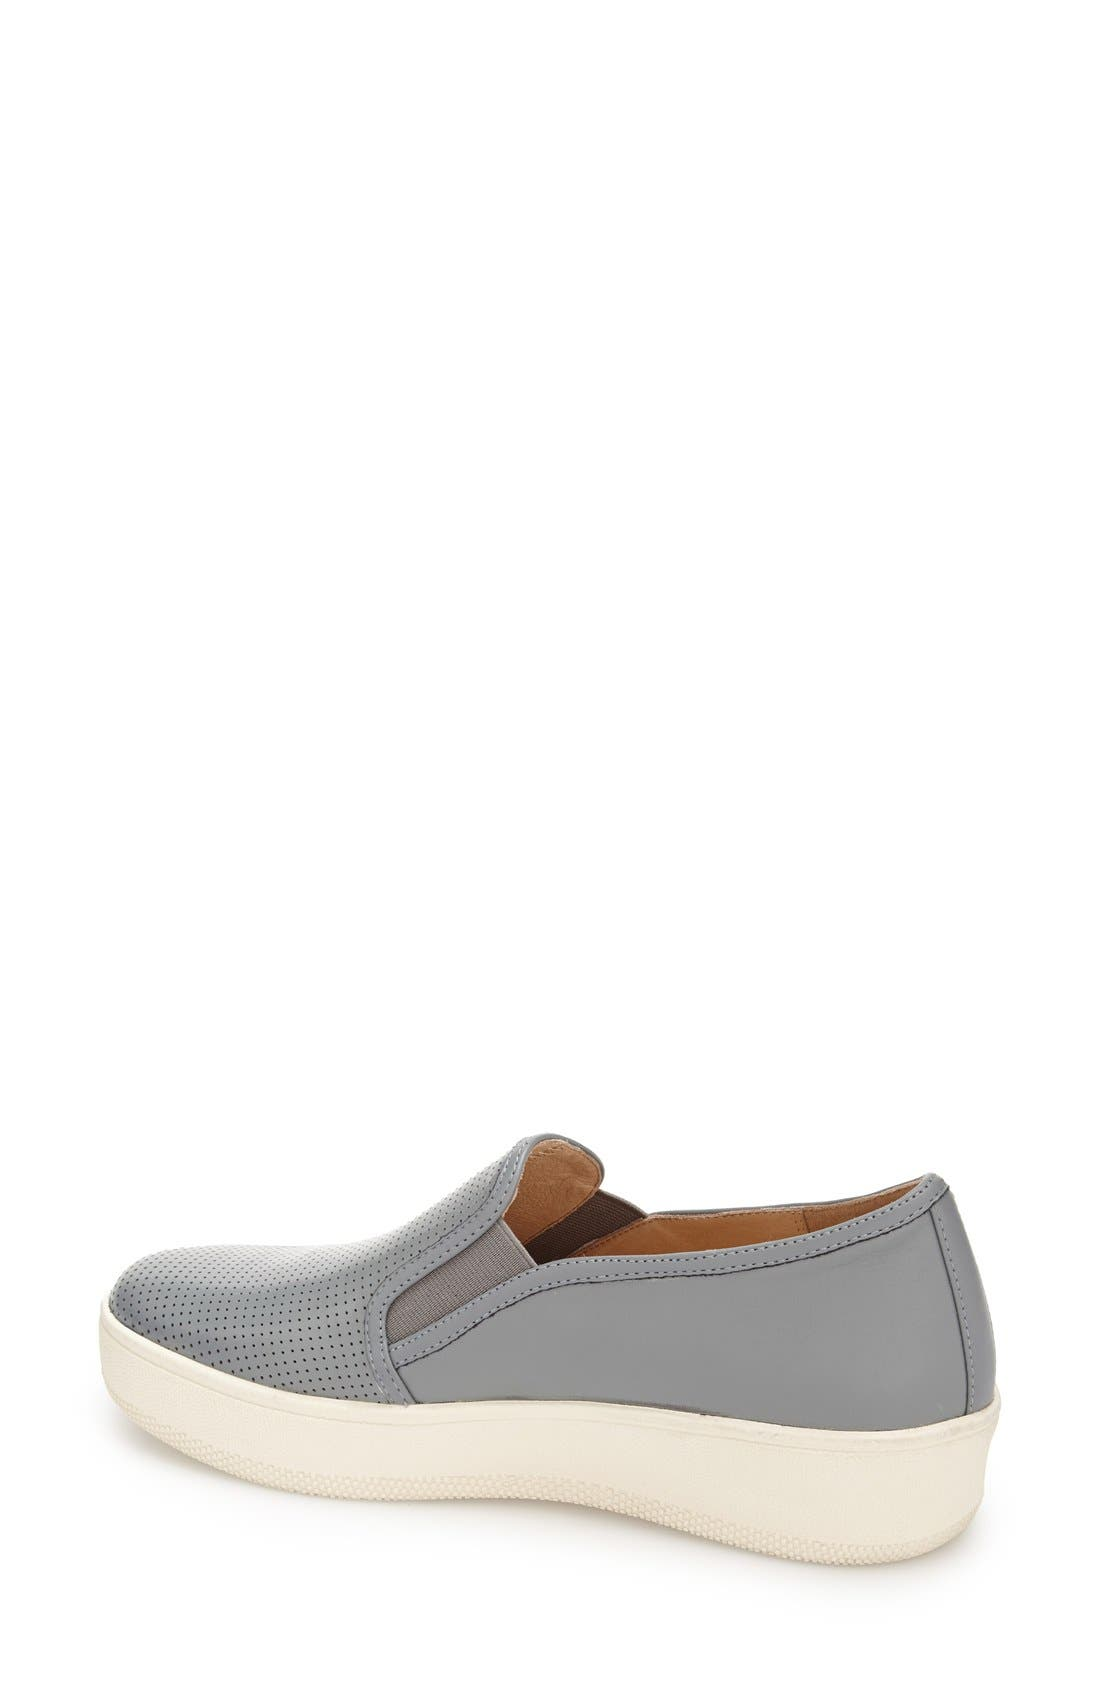 Alternate Image 2  - JSlides 'Jibbie' Slip-On Platform Sneaker (Women)